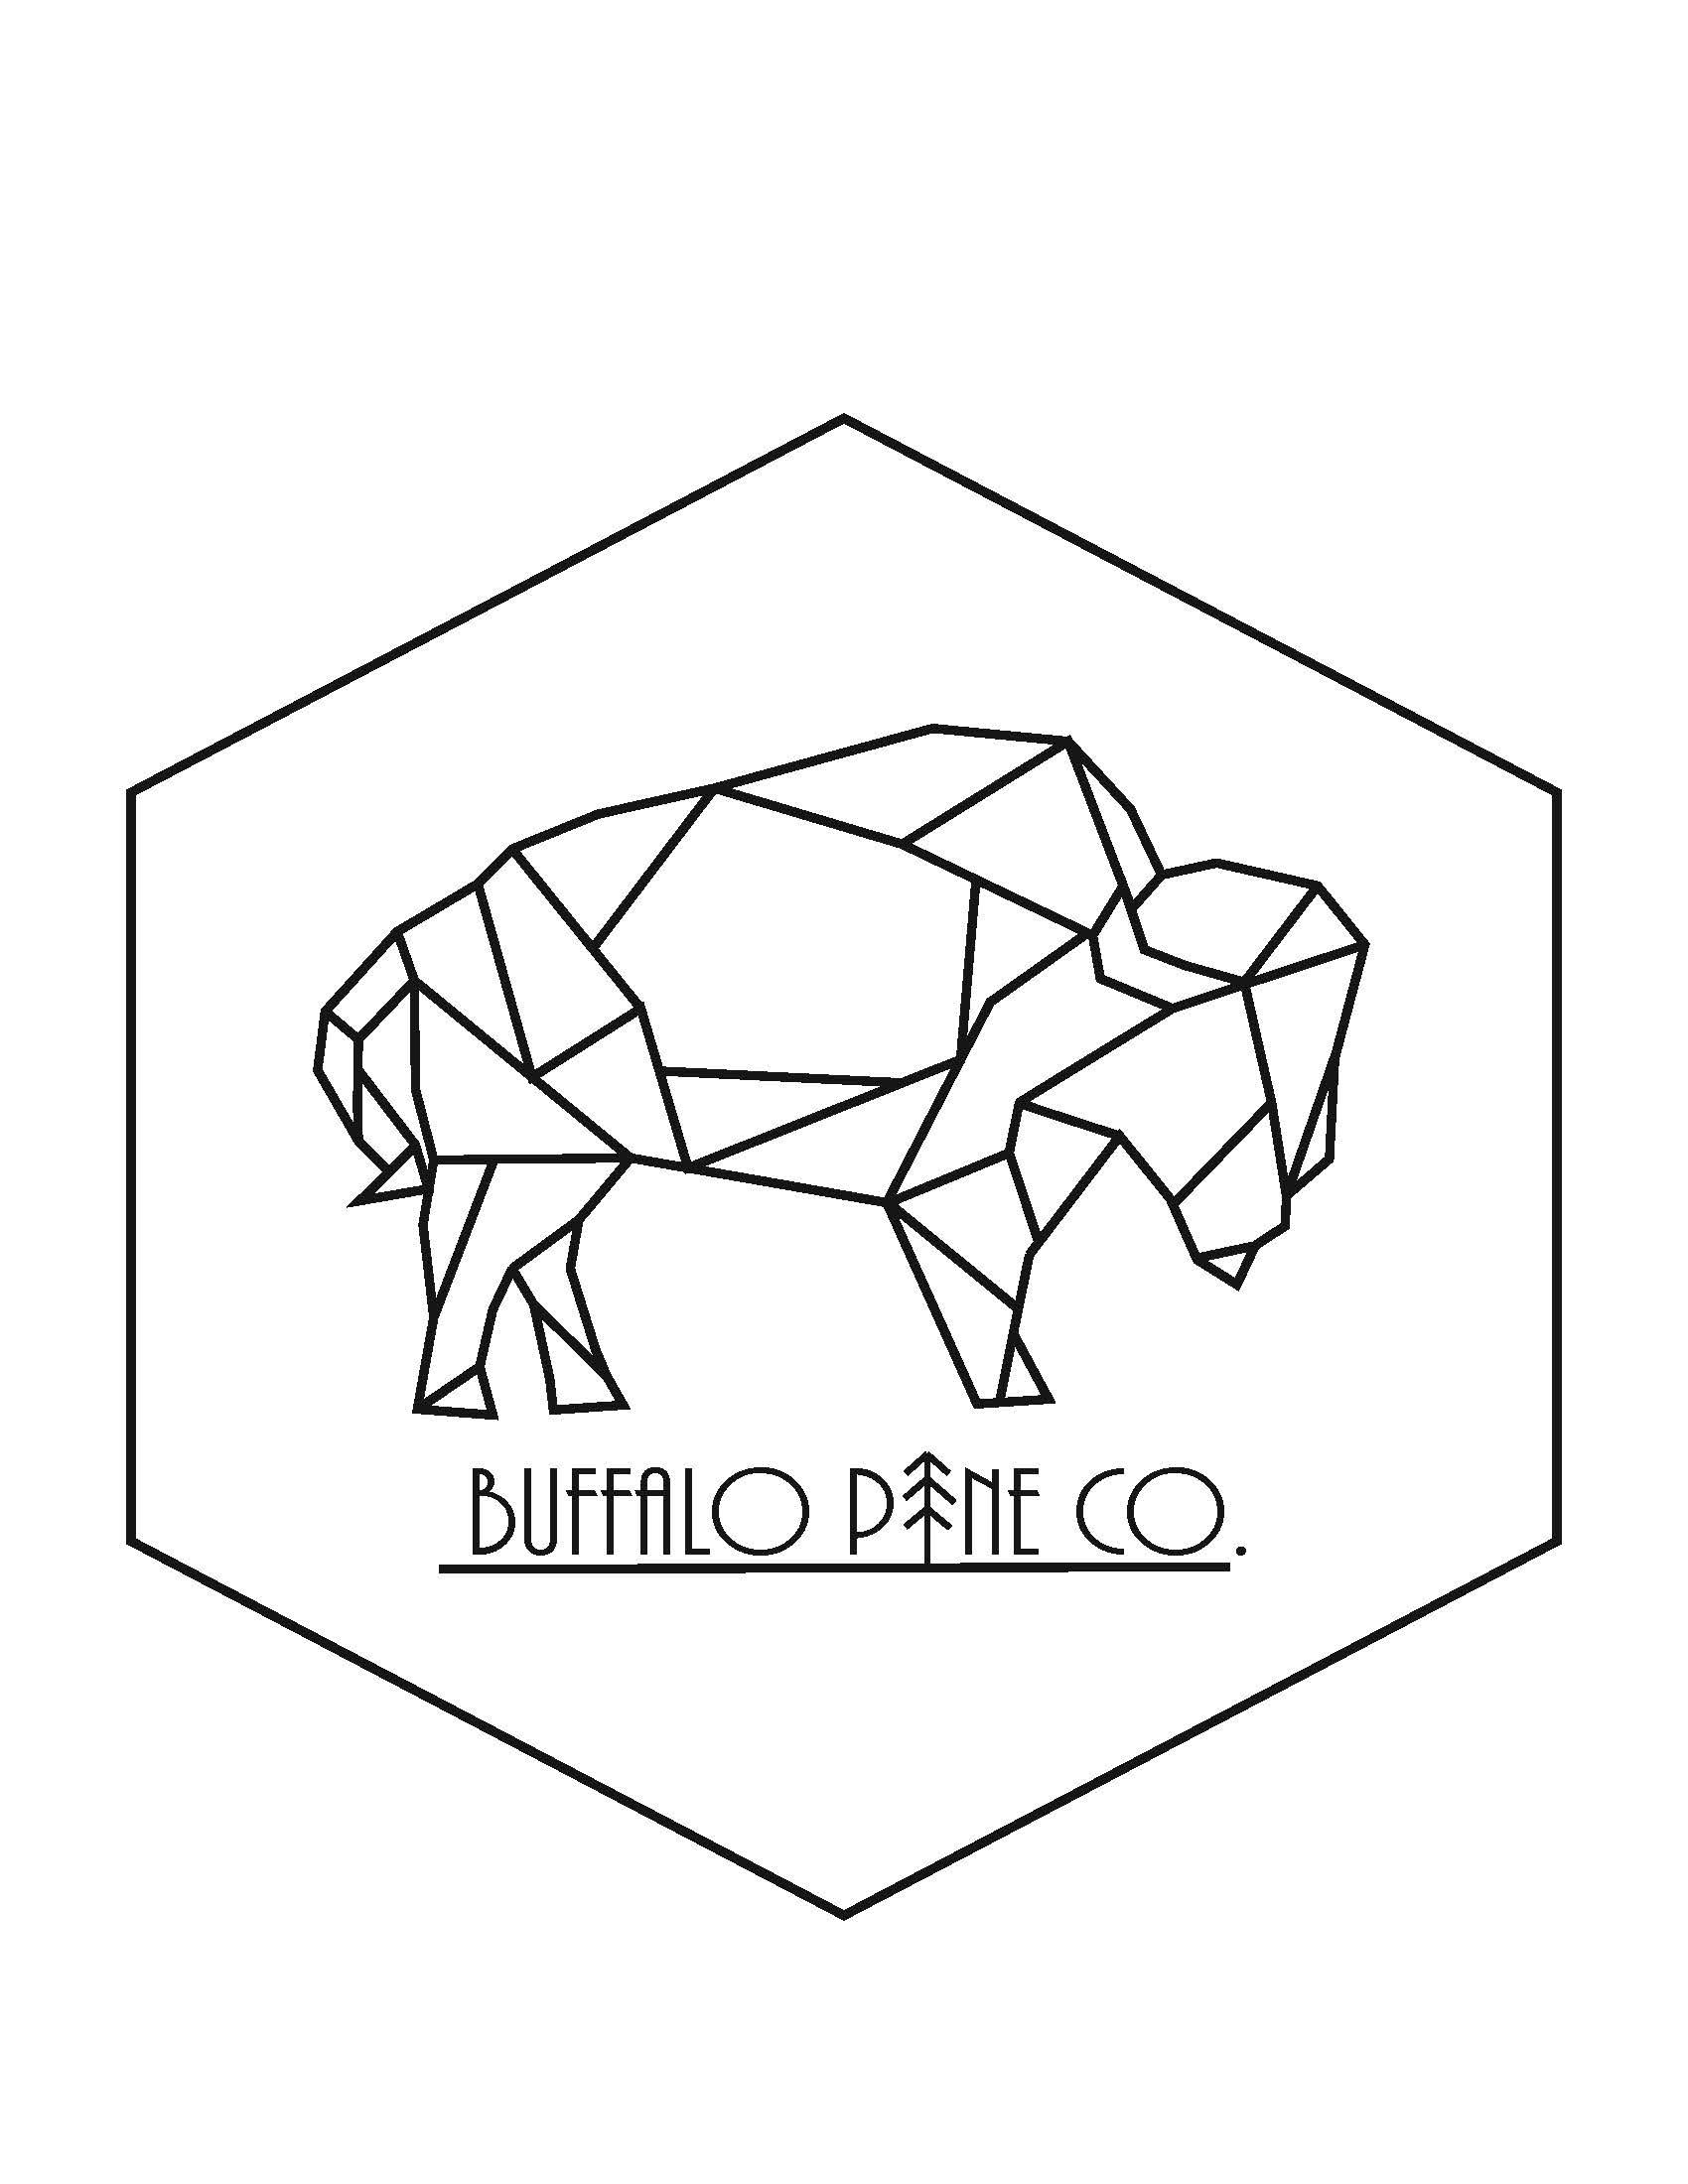 Buffalo Pine Co. Logo.jpg